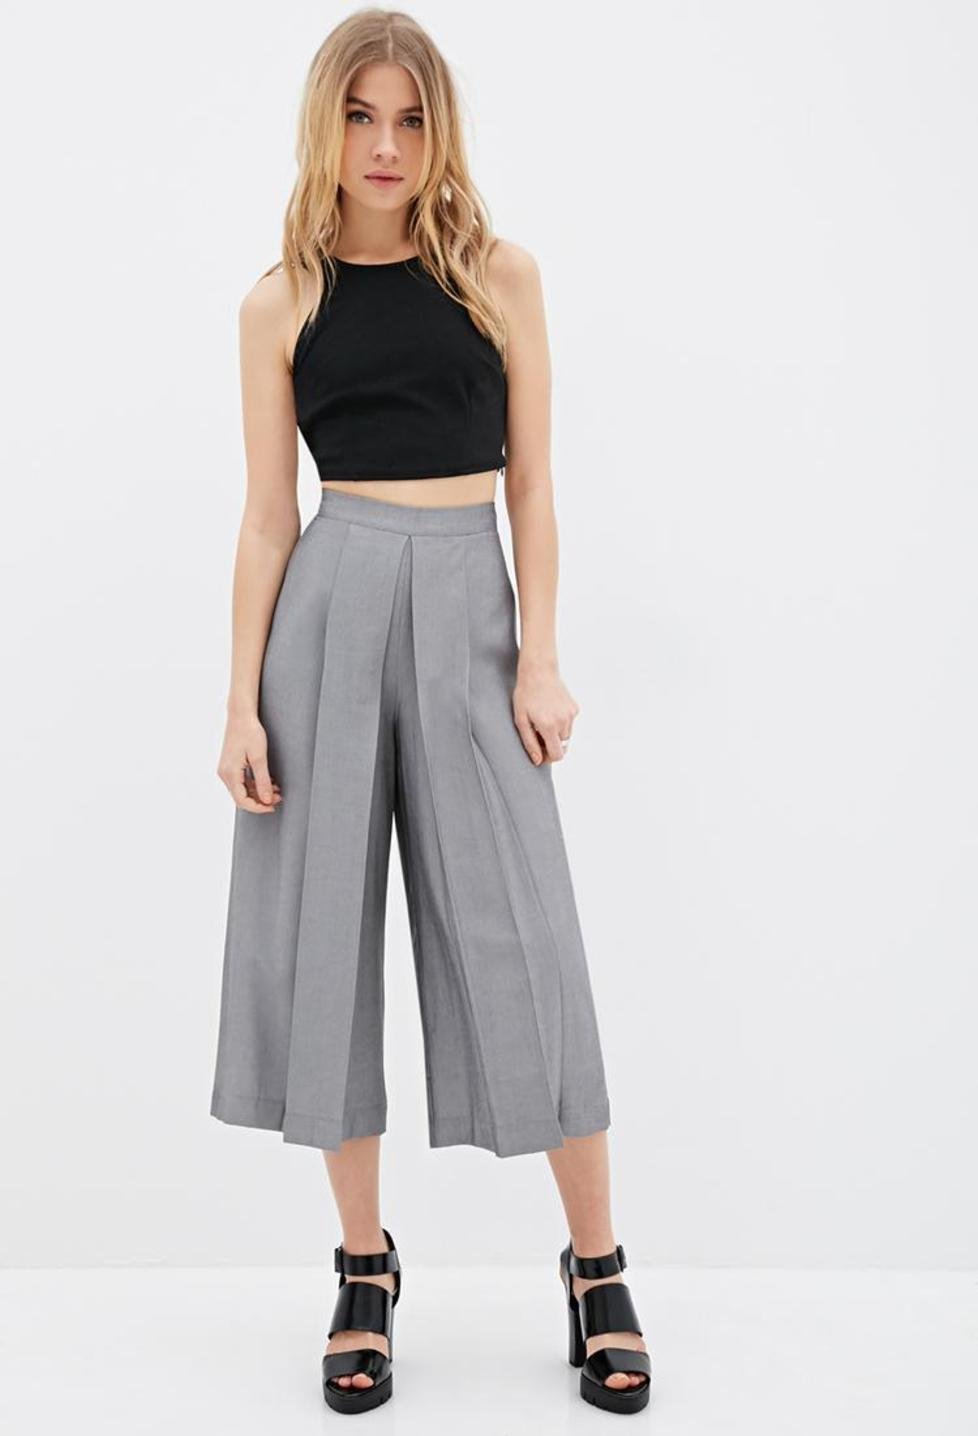 grayl-culottes-pants-black-top-crop-blonde-black-shoe-sandalh-spring-summer-style-fashion-wear-trouser-chunky-dinner.jpg